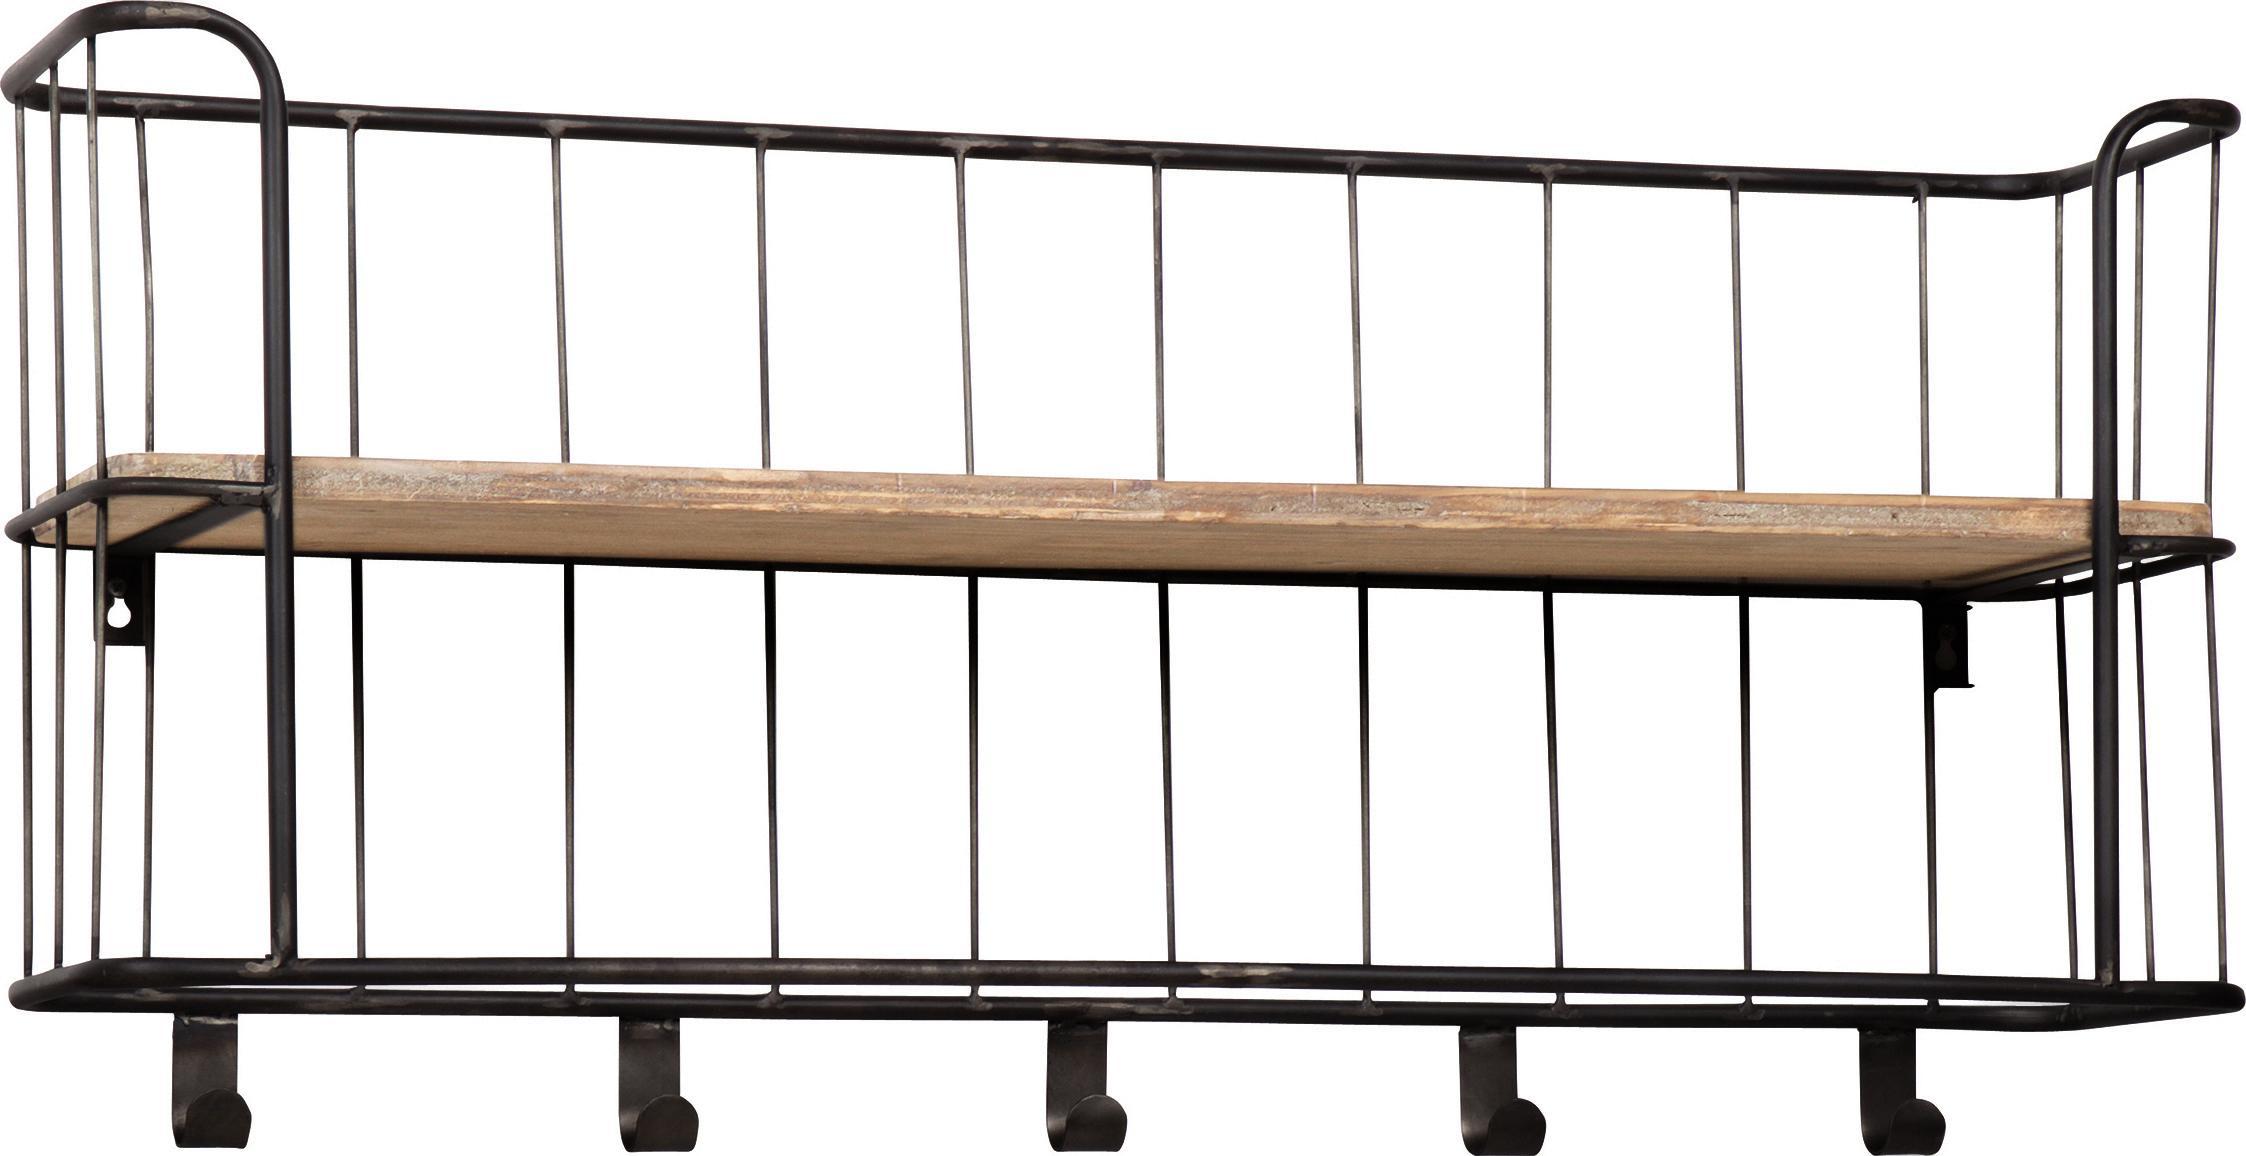 Wandkapstok Giro, Frame: verchroomd metaal, Plank: mangohout, Frame: chroomkleurig. Plank: mangohoutkleurig, 85 x 40 cm